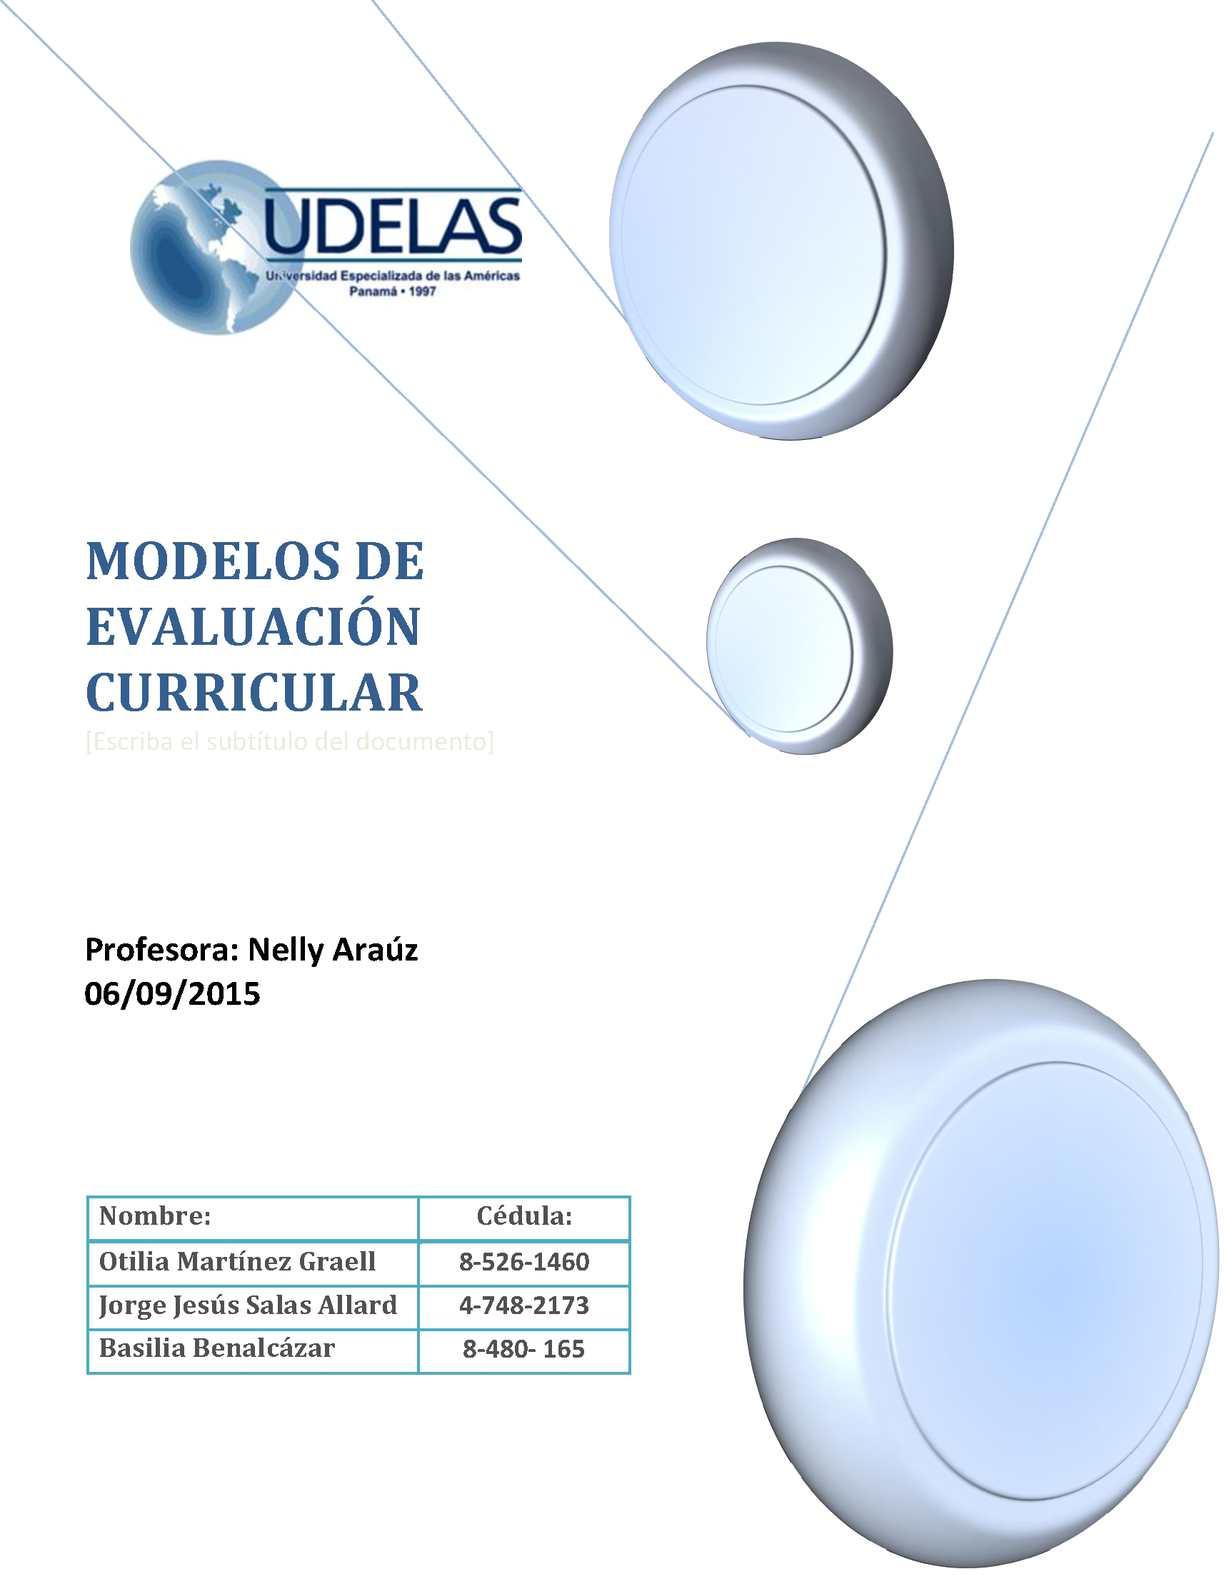 Modelos De Evalucion Curricular